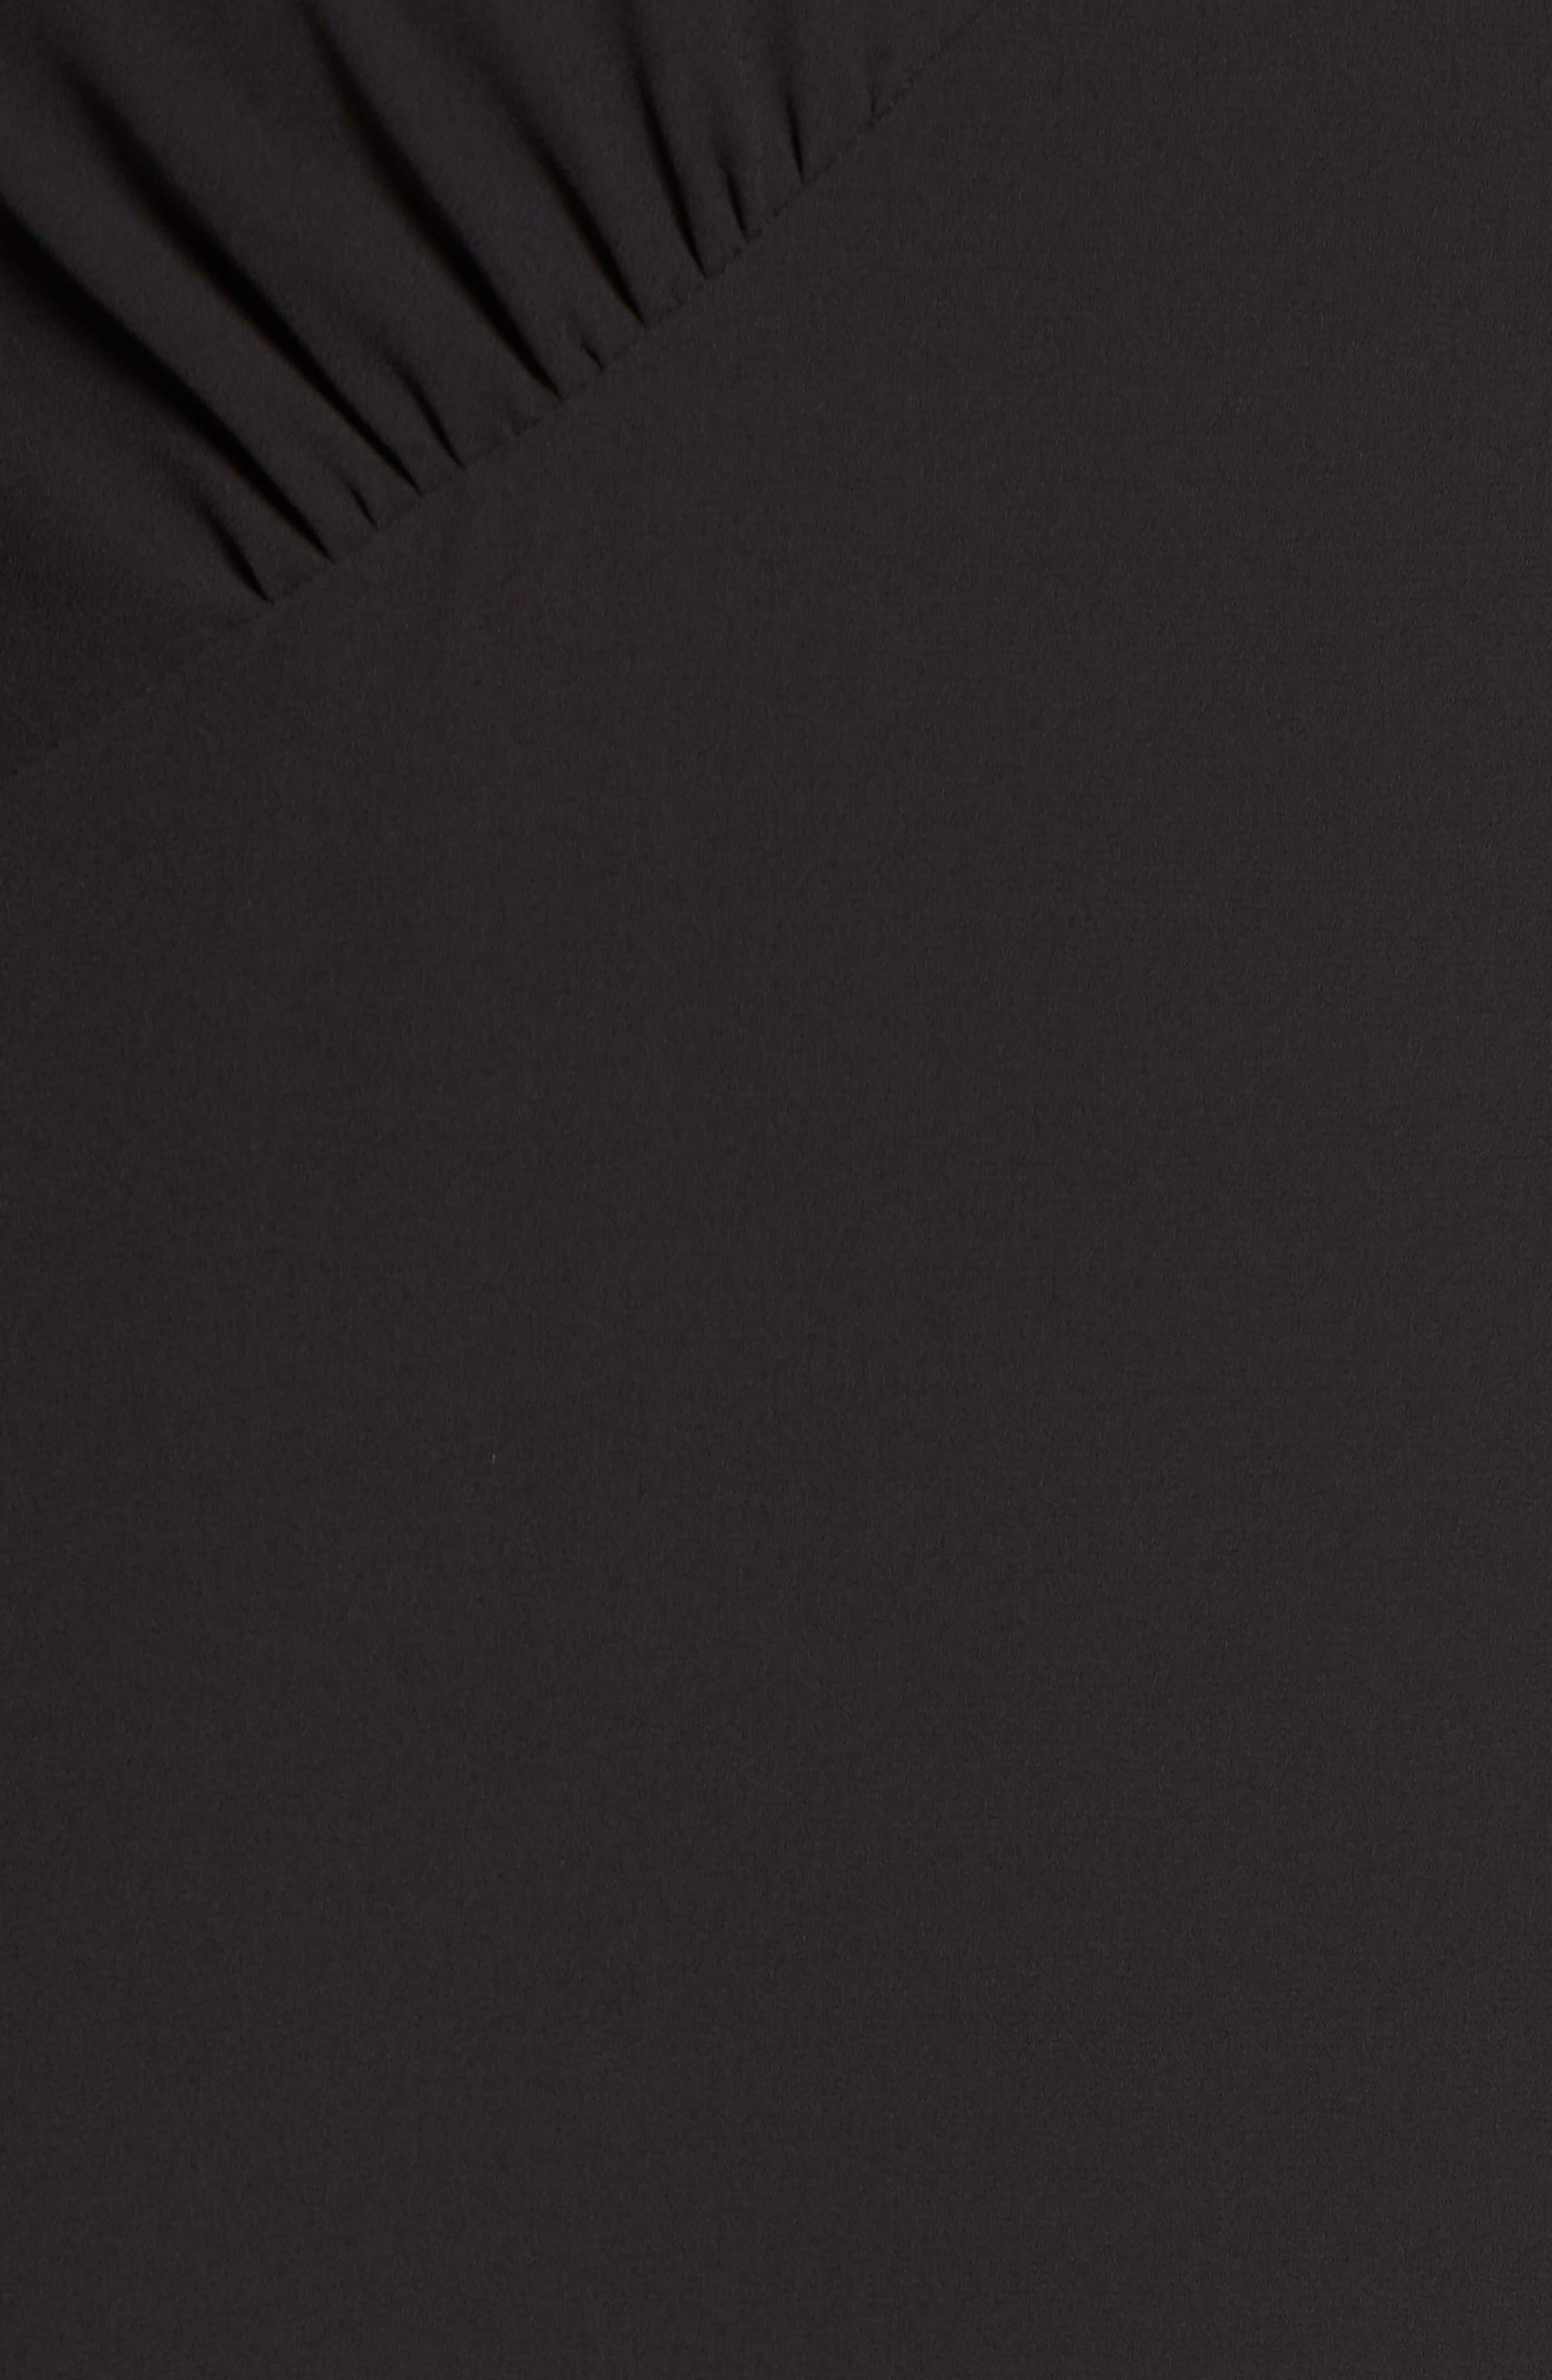 Daikon Cold Shoulder Dress,                             Alternate thumbnail 5, color,                             Black